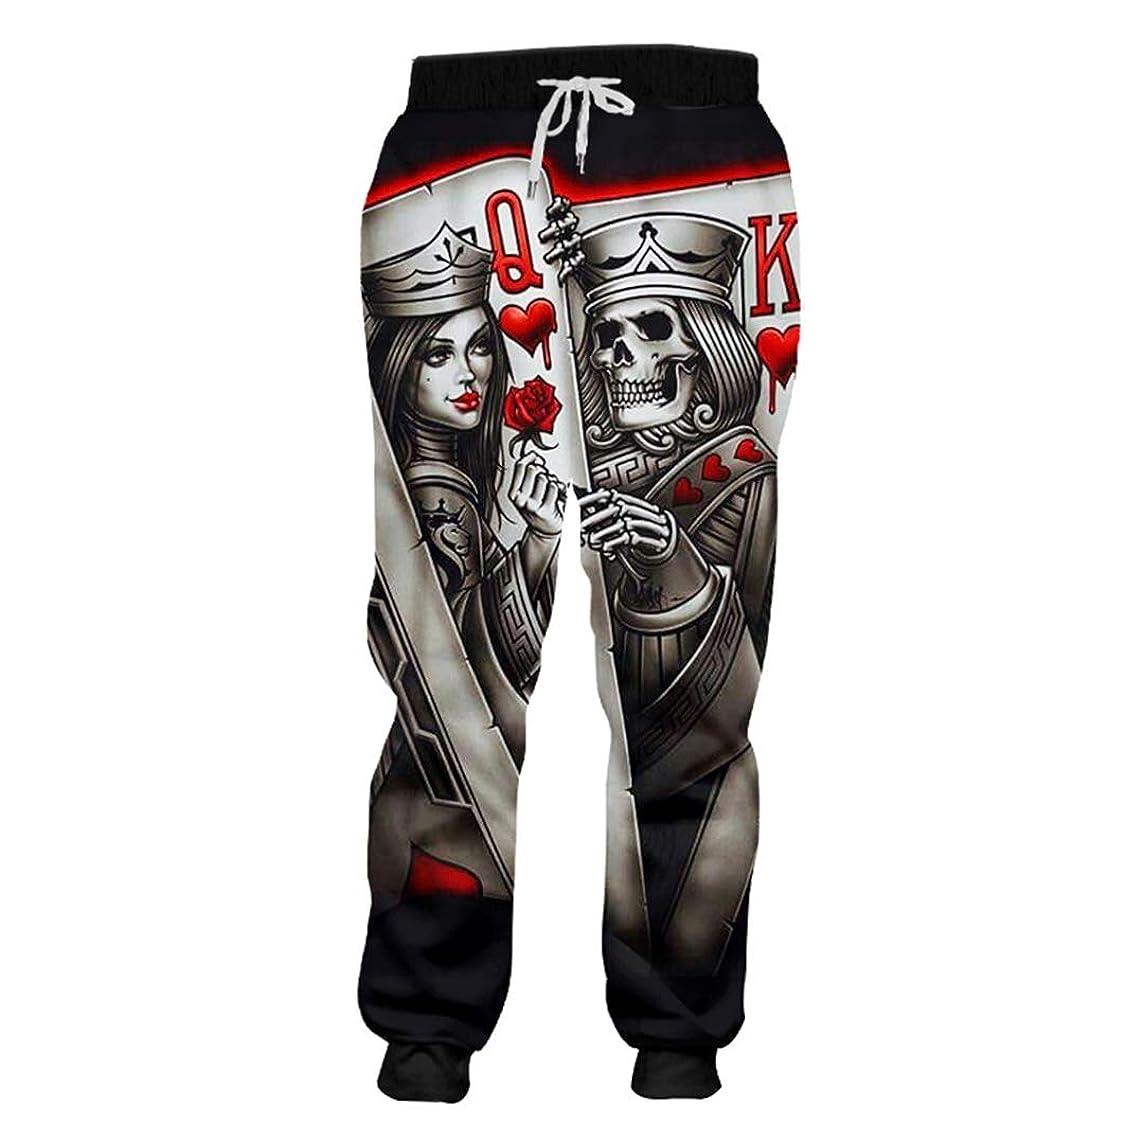 Men Harem Pants 3D Print Queen King Poker Skull Sweatpants Homme Full Length Leisure Sweat Pants Plus Size